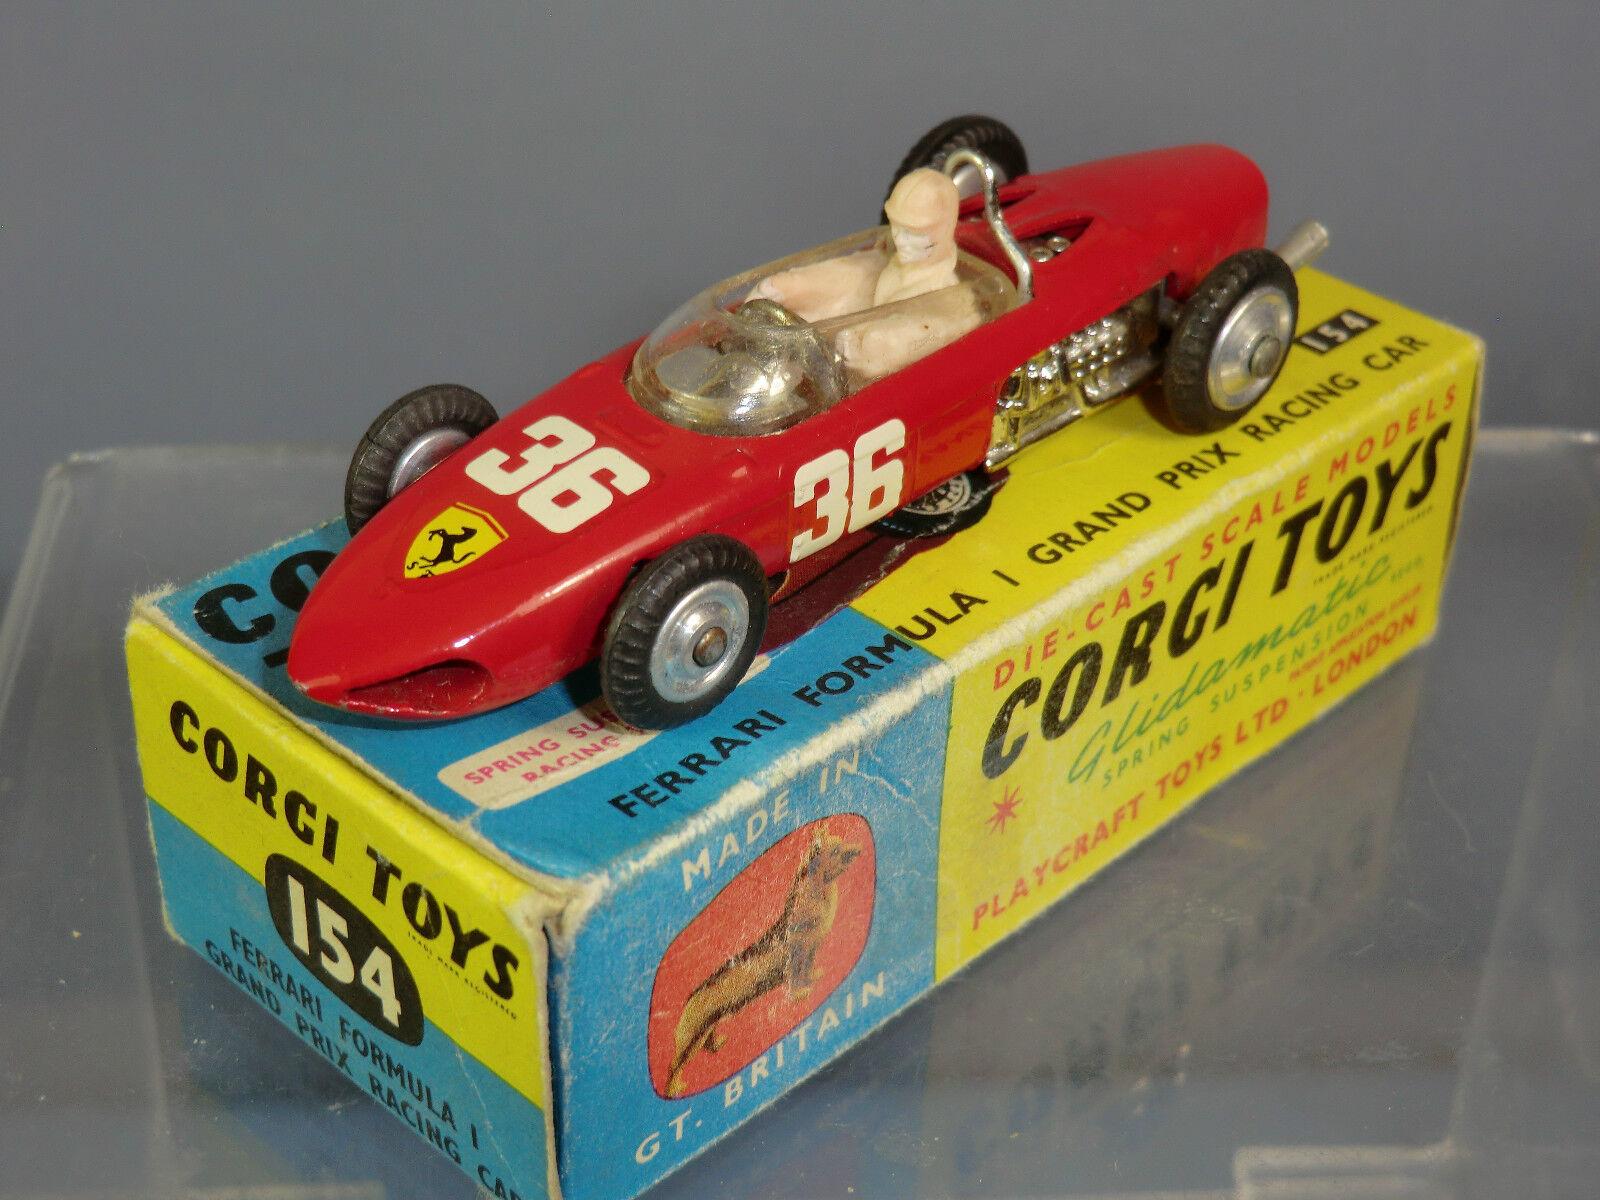 promocionales de incentivo Vintage Corgi Juguetes Modelo No.154 Ferrari Fórmula 1 Gran Premio Premio Premio MIB de coche  con 60% de descuento